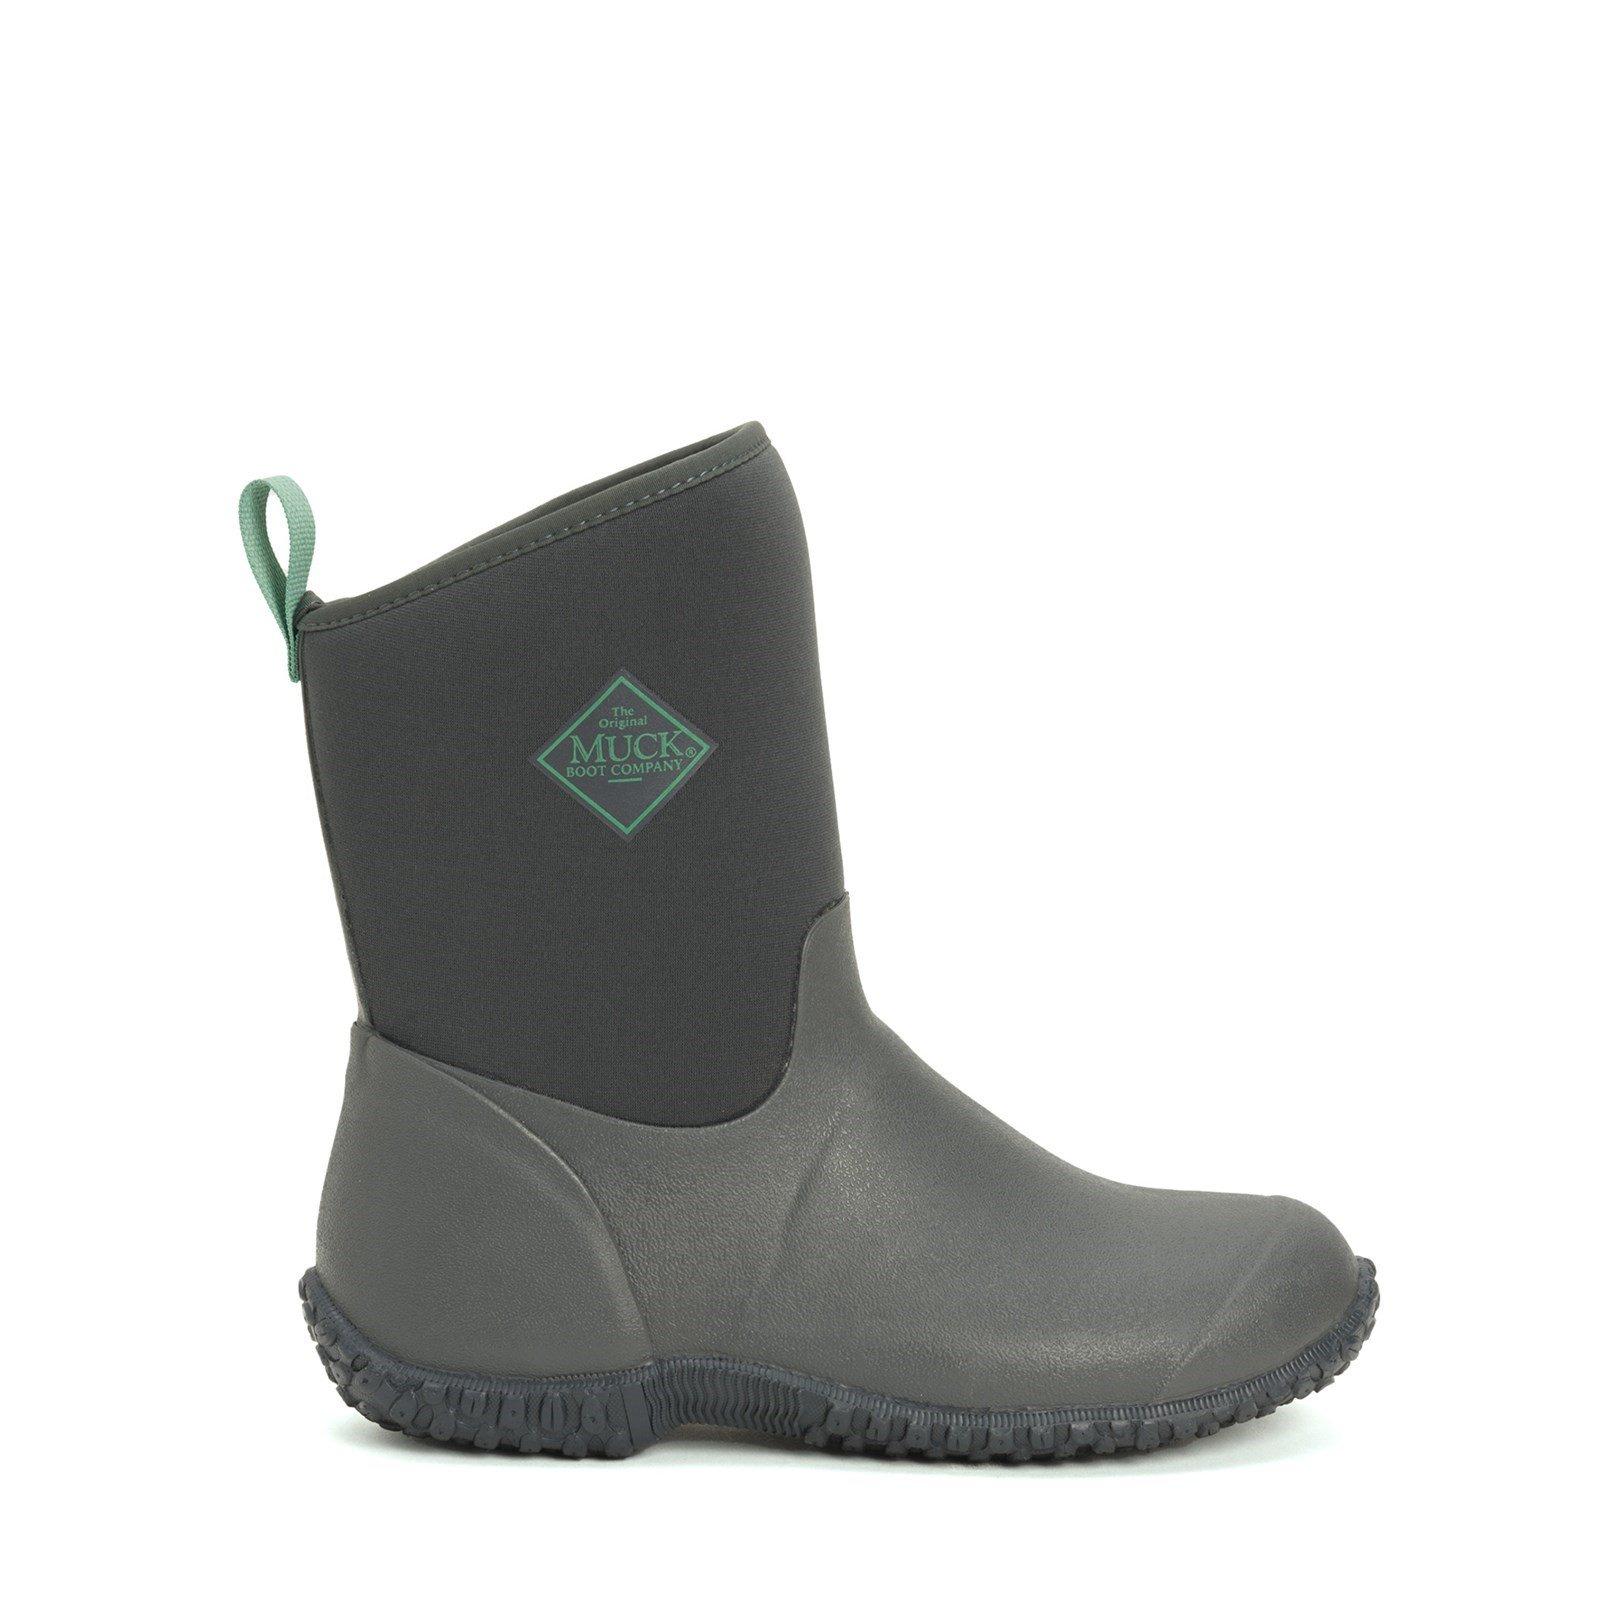 Muck Boots Women's Muckster II Slip On Short Boot Multicolor 28899 - Grey/Print 6